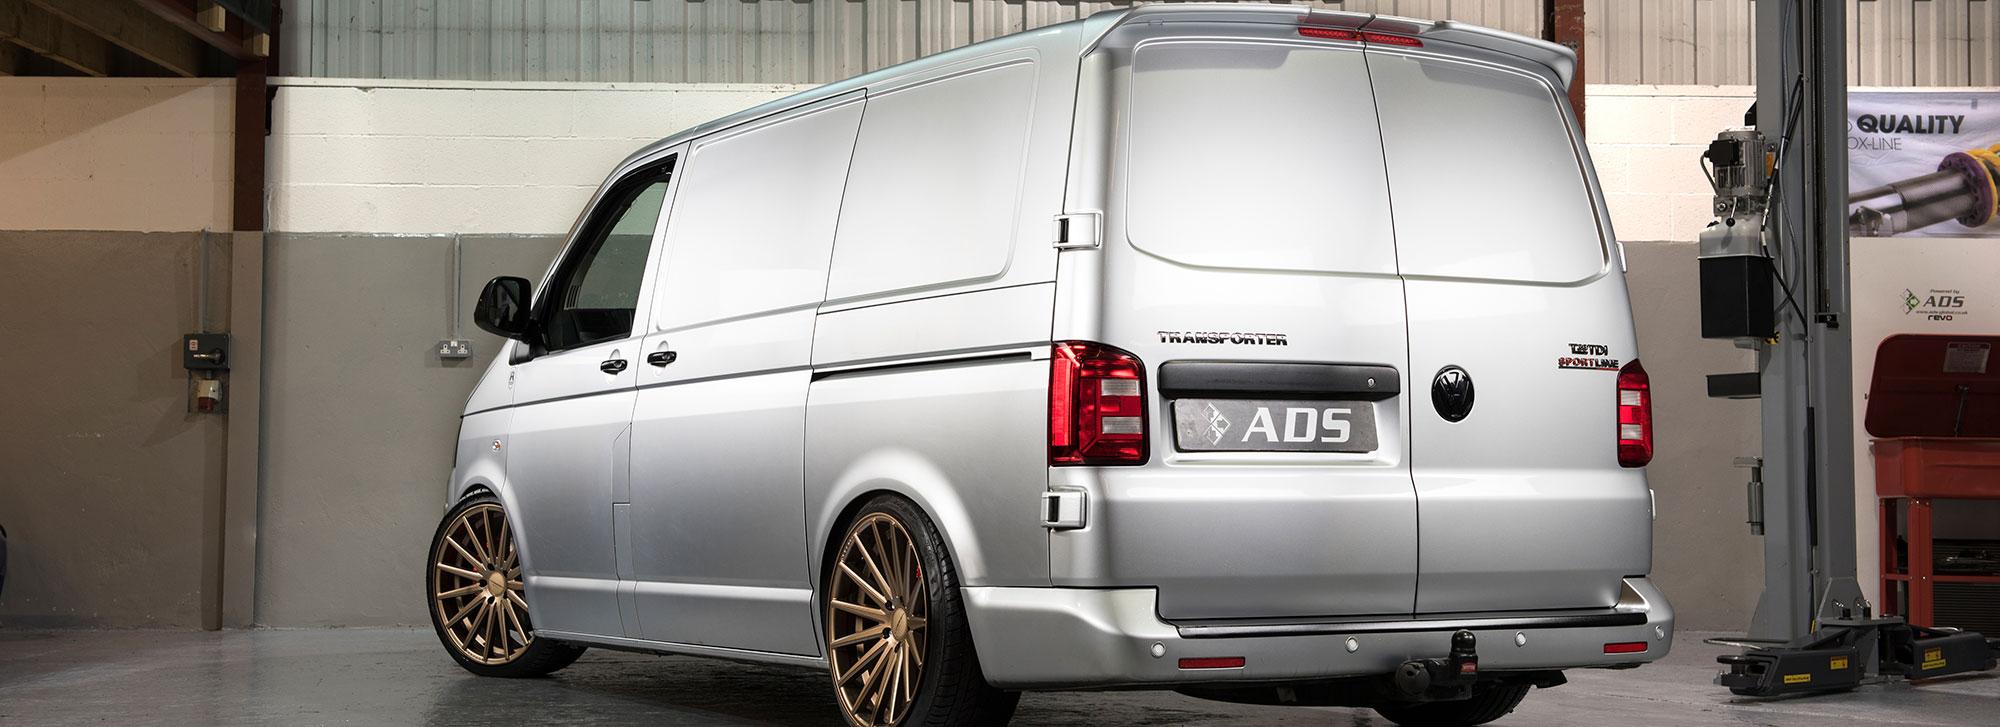 Volkswagen and Audi servicing Preston